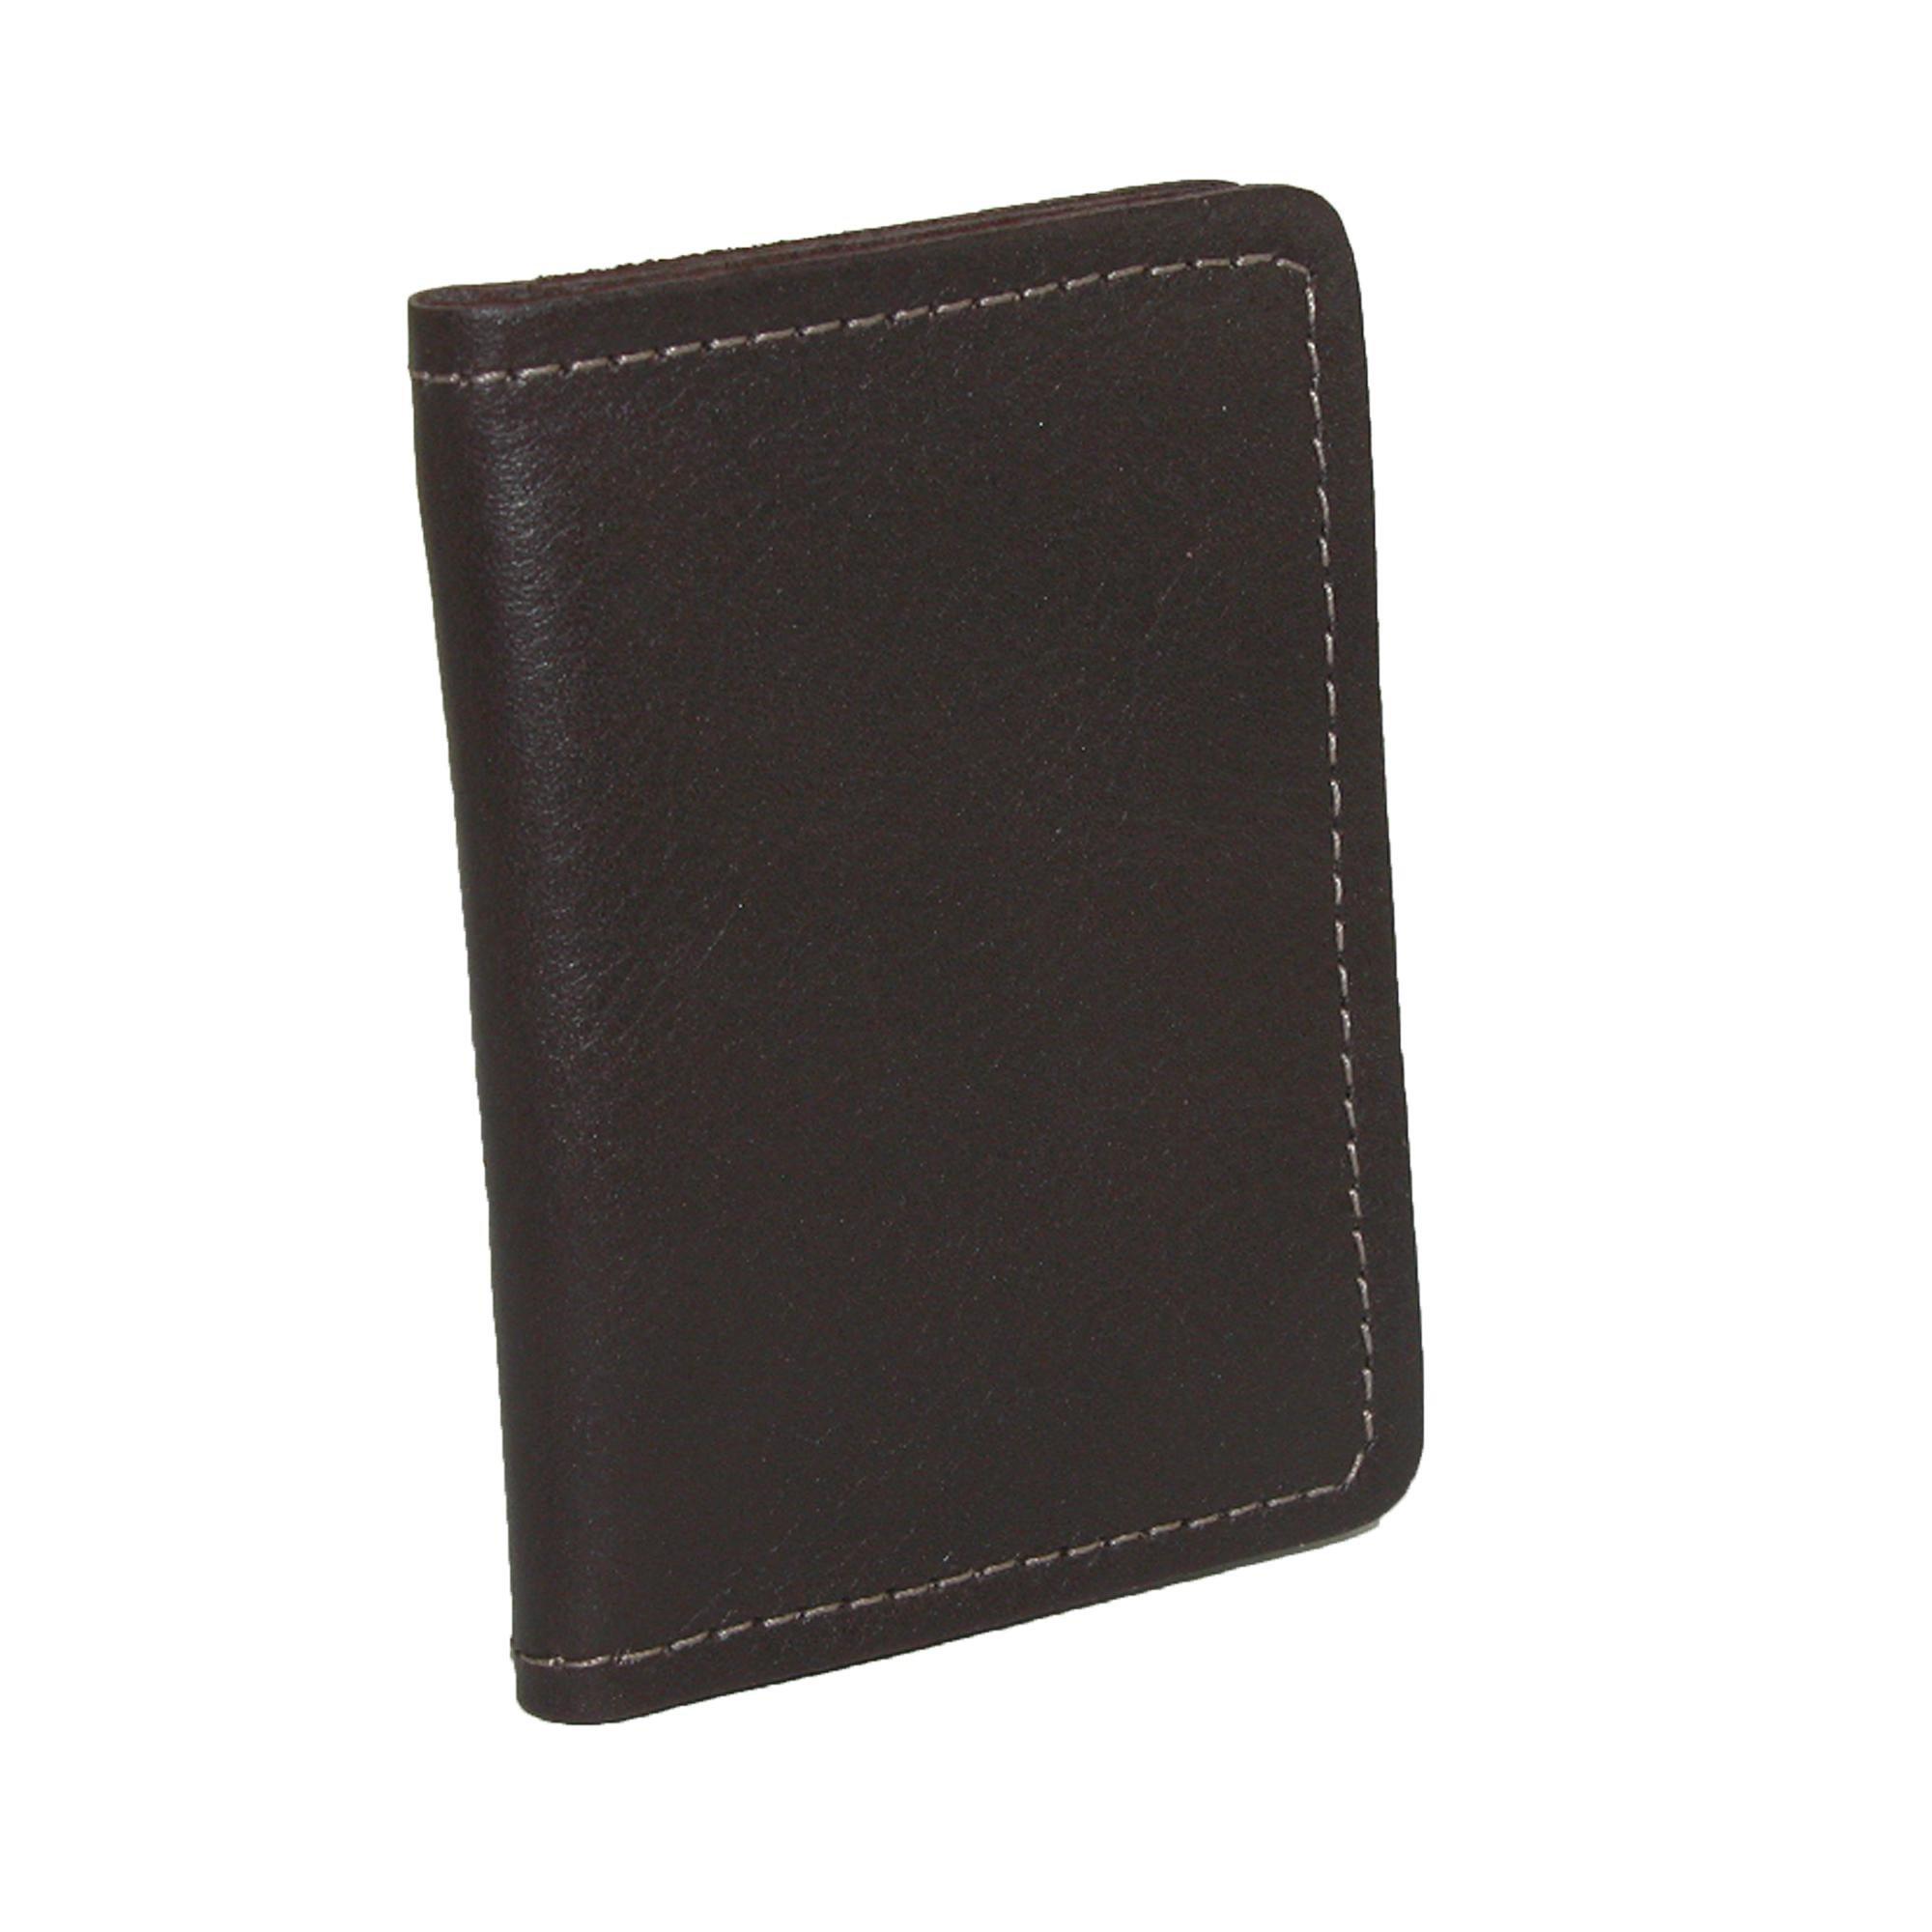 CTM Men's Leather Money Clip BiFold Front Pocket Wallet, Brown